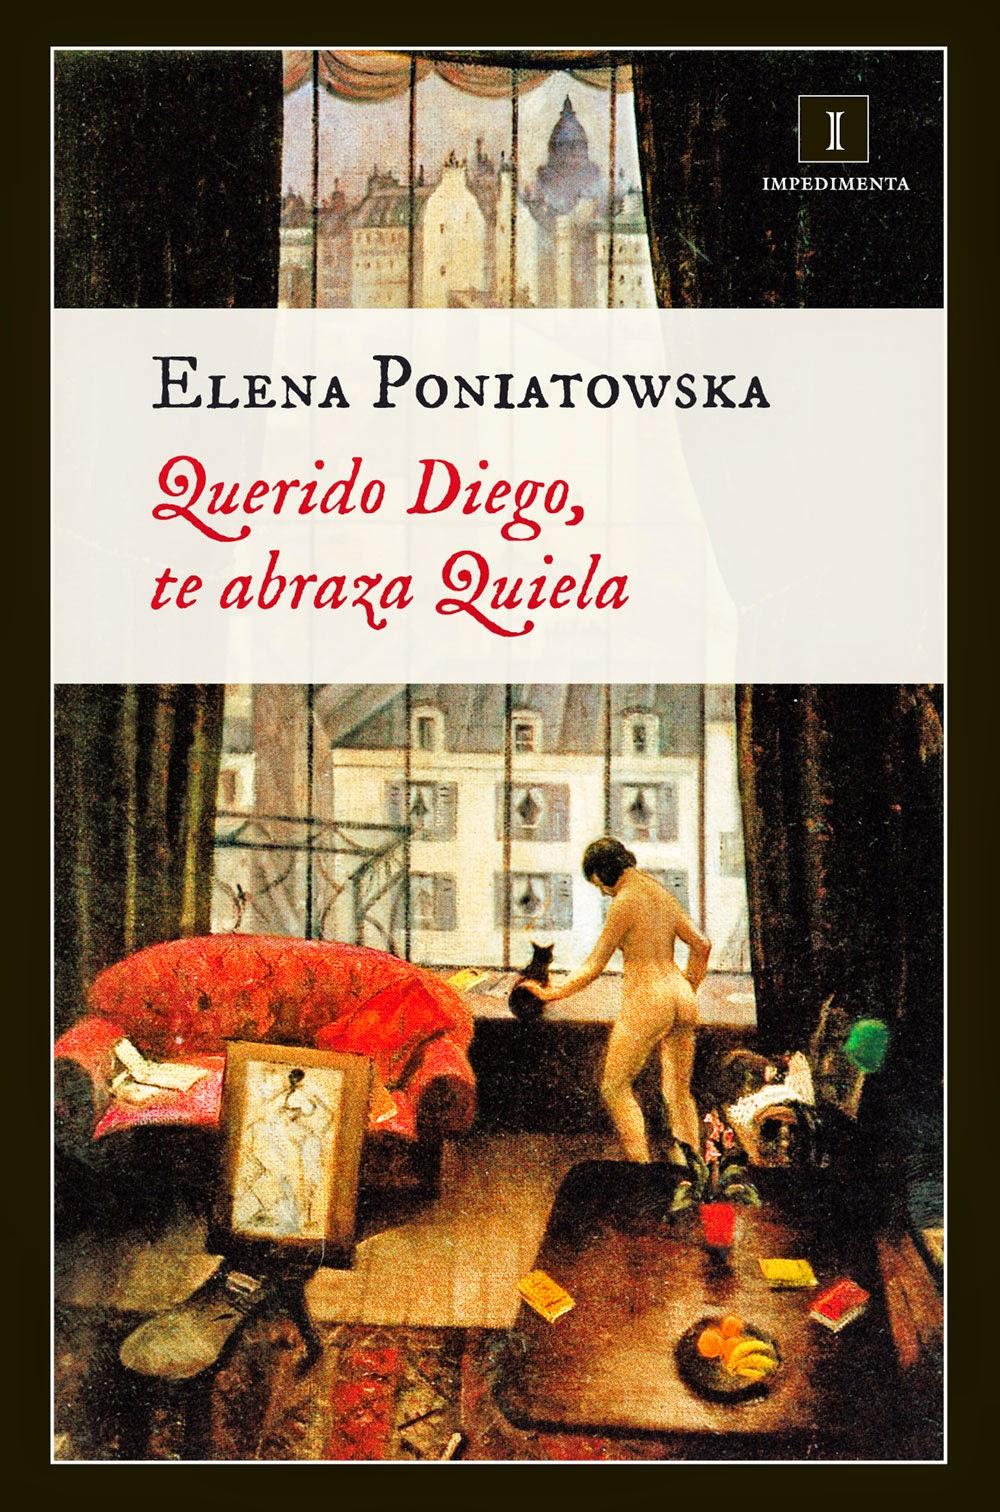 Querido Diego, te abraza Piela